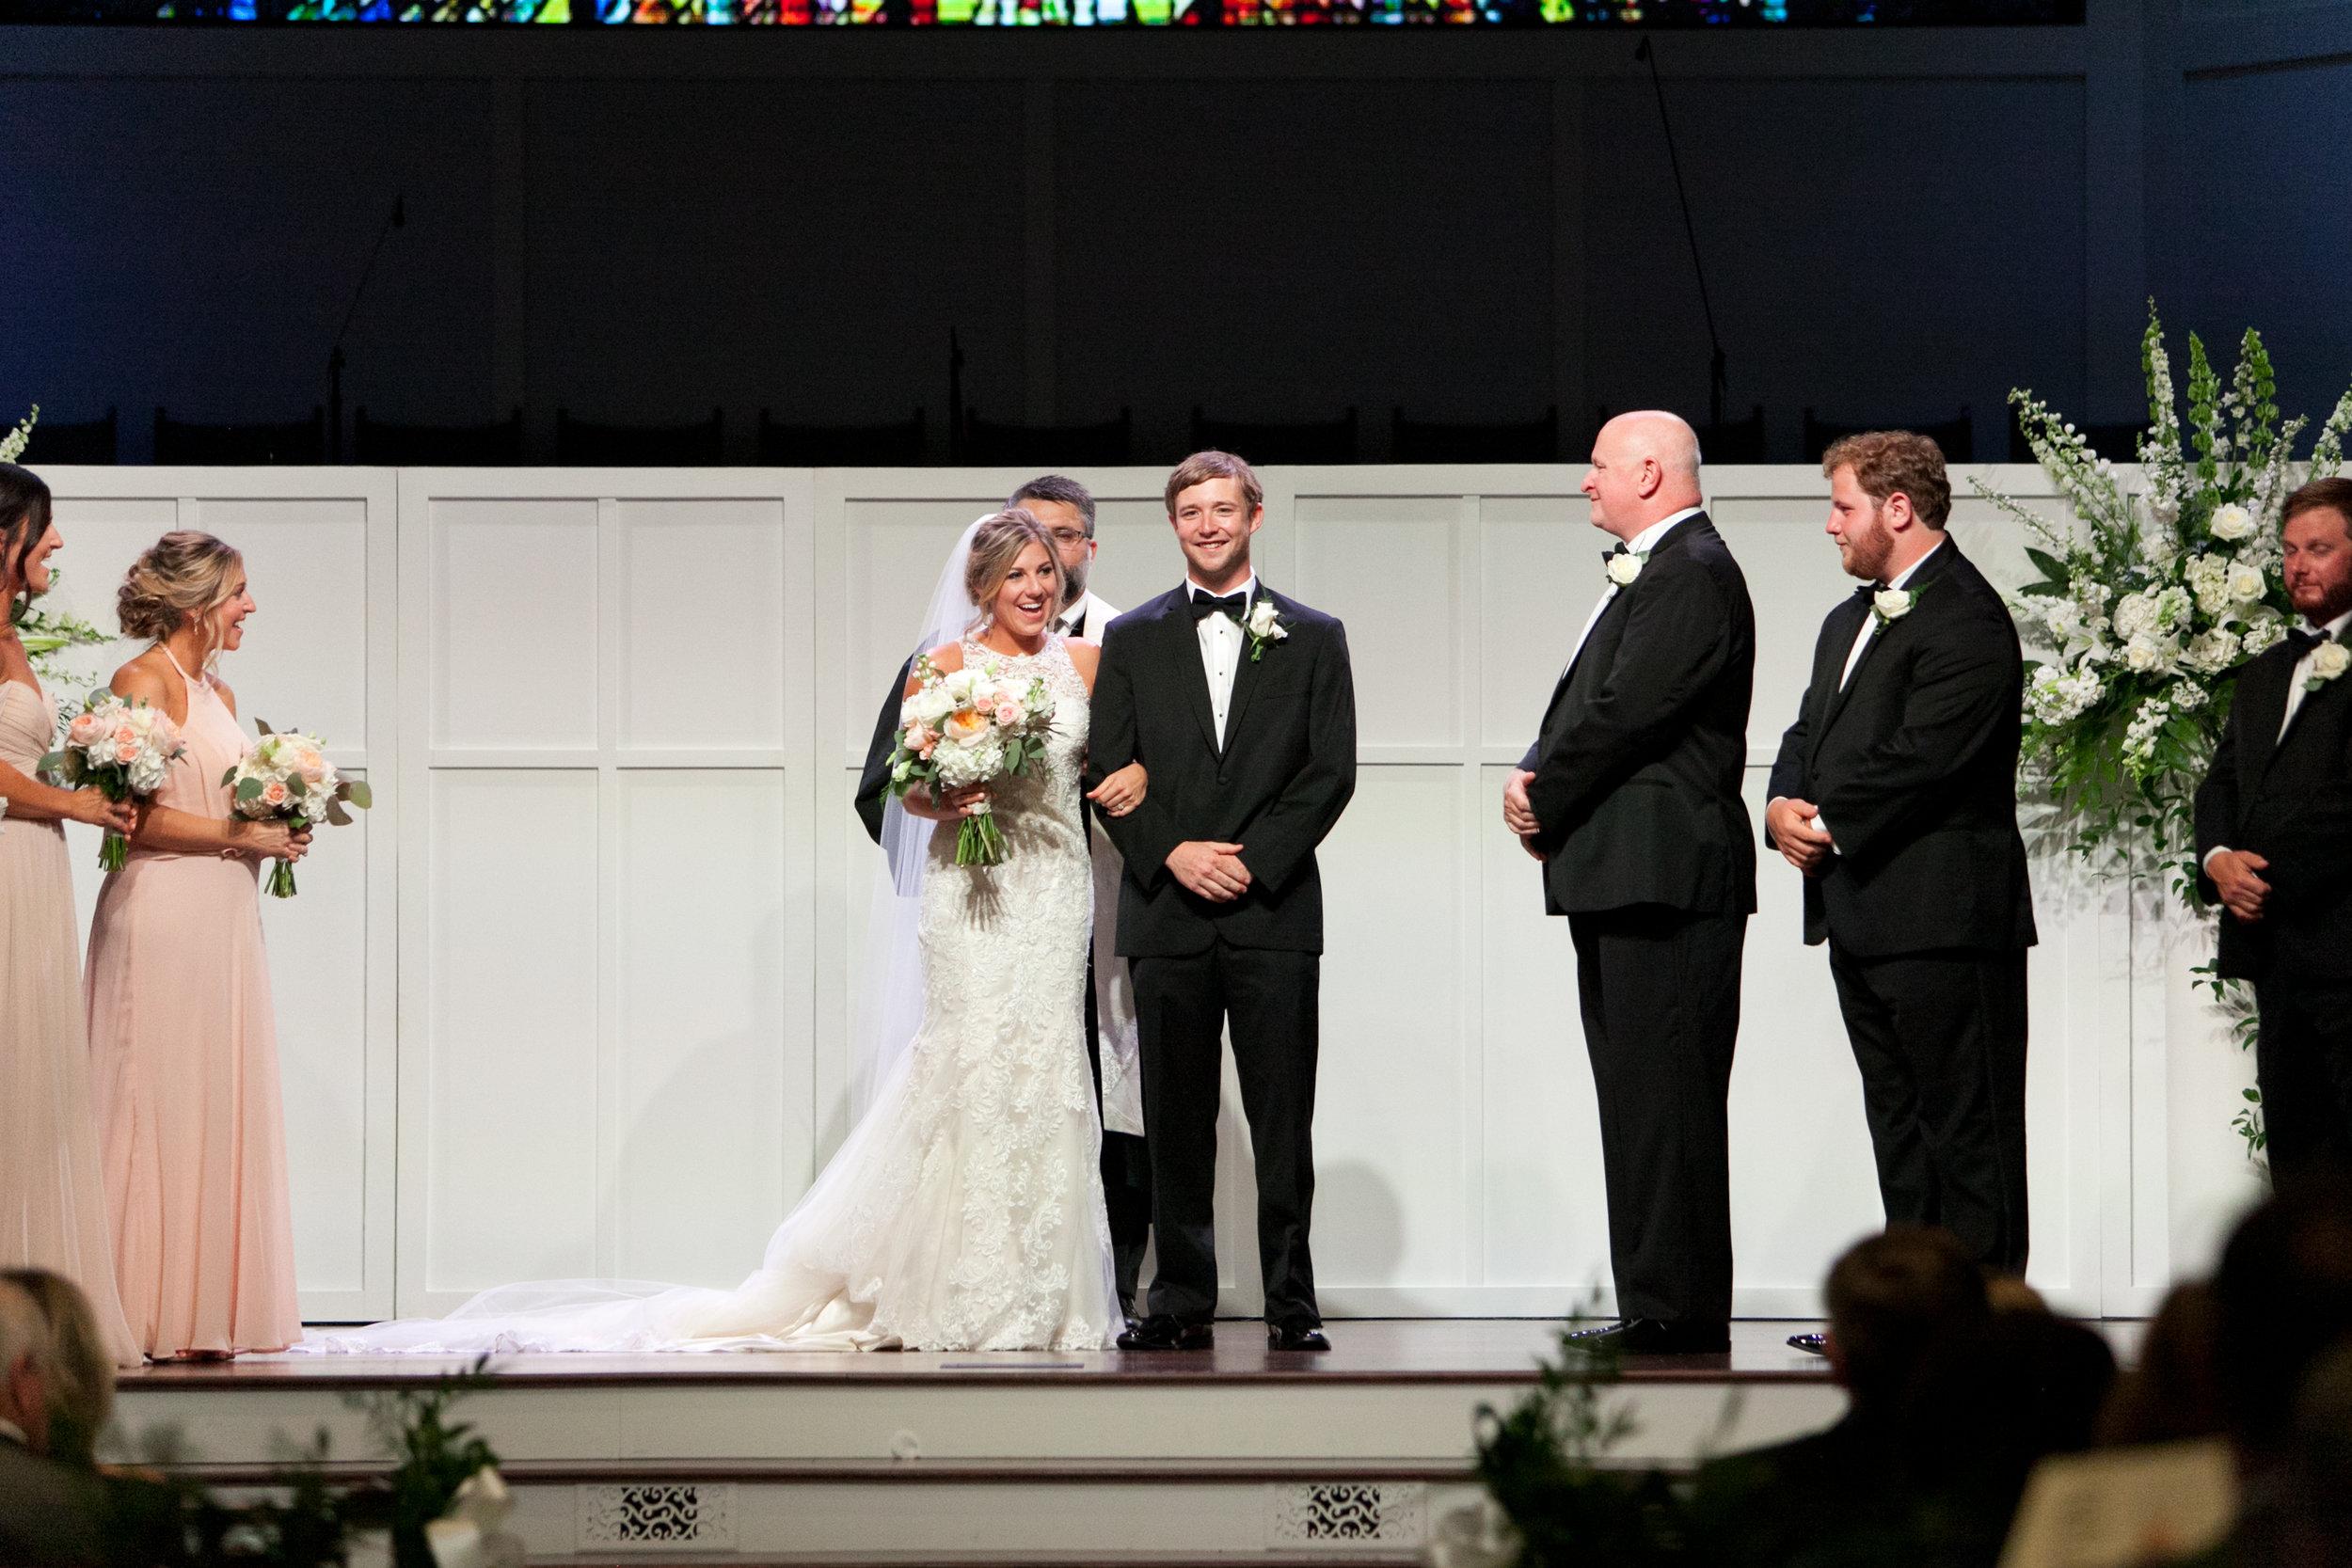 701_whaley_wedding_33.jpg